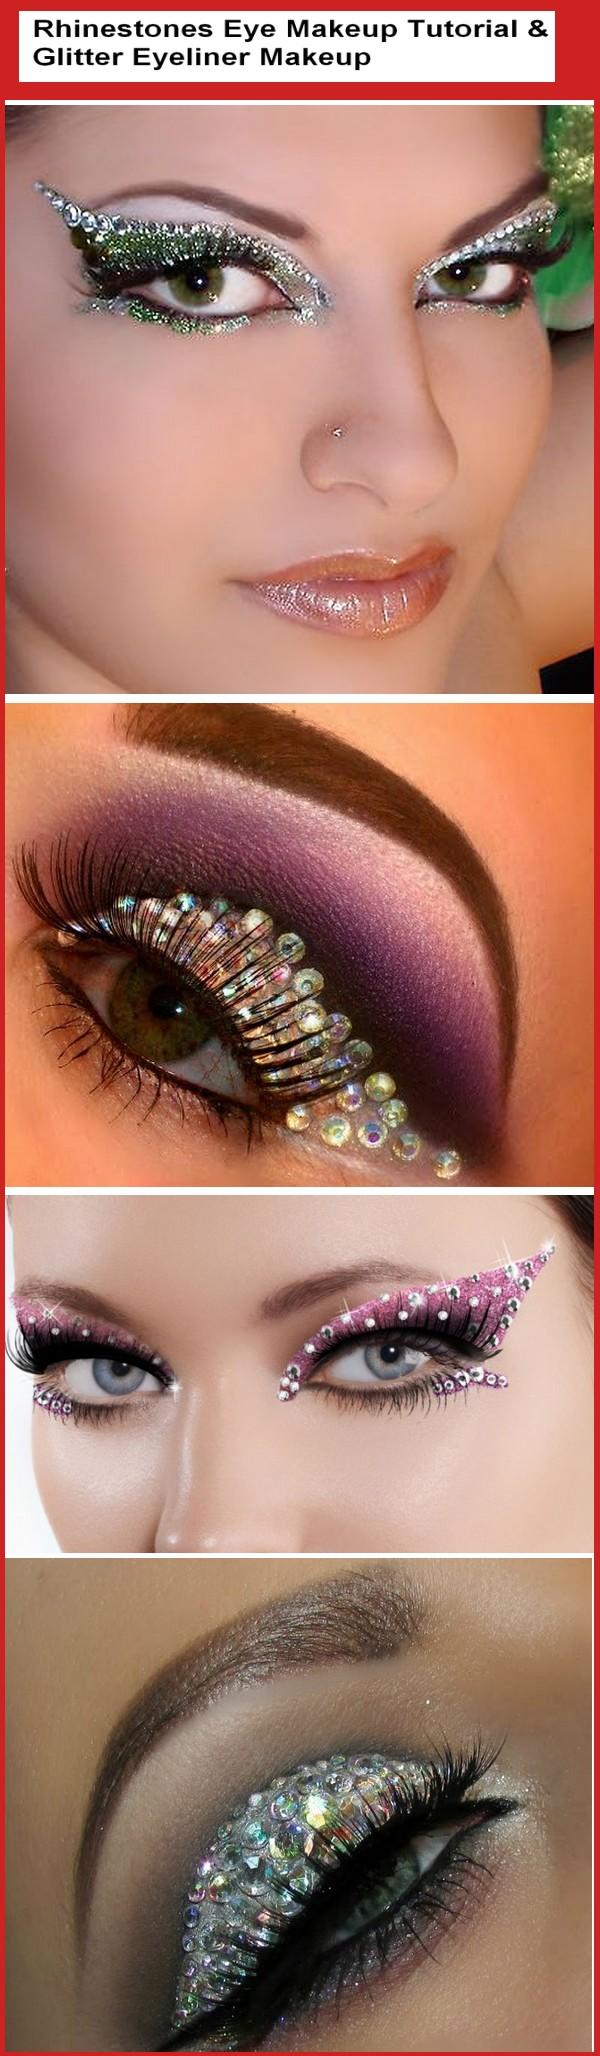 Rhinestones Eye Makeup Tutorial (With images) No